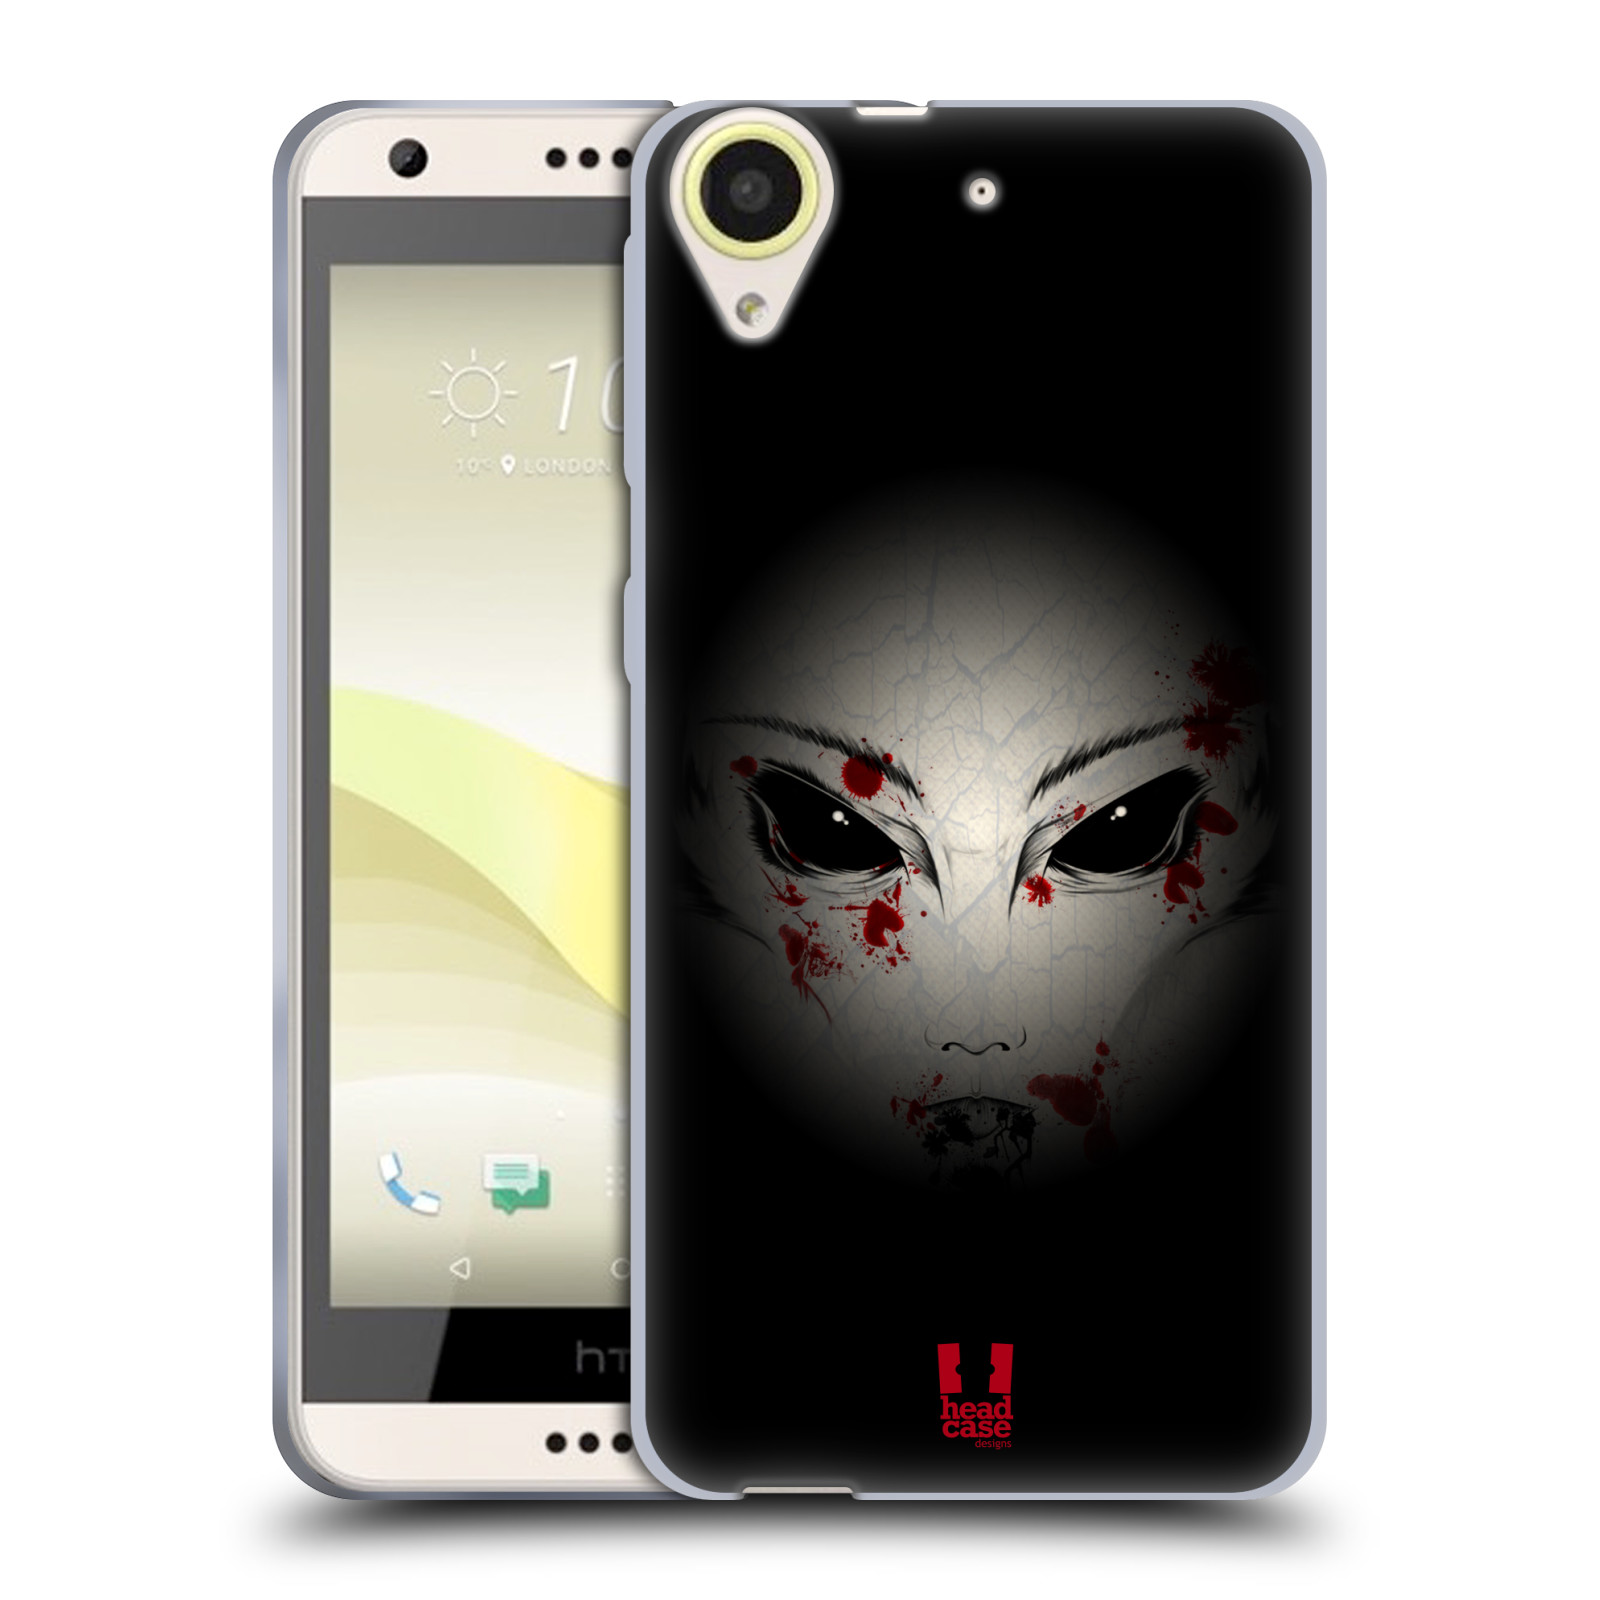 Silikonové pouzdro na mobil HTC Desire 650 HEAD CASE Macabre (Silikonový kryt či obal na mobilní telefon HTC Desire 650)